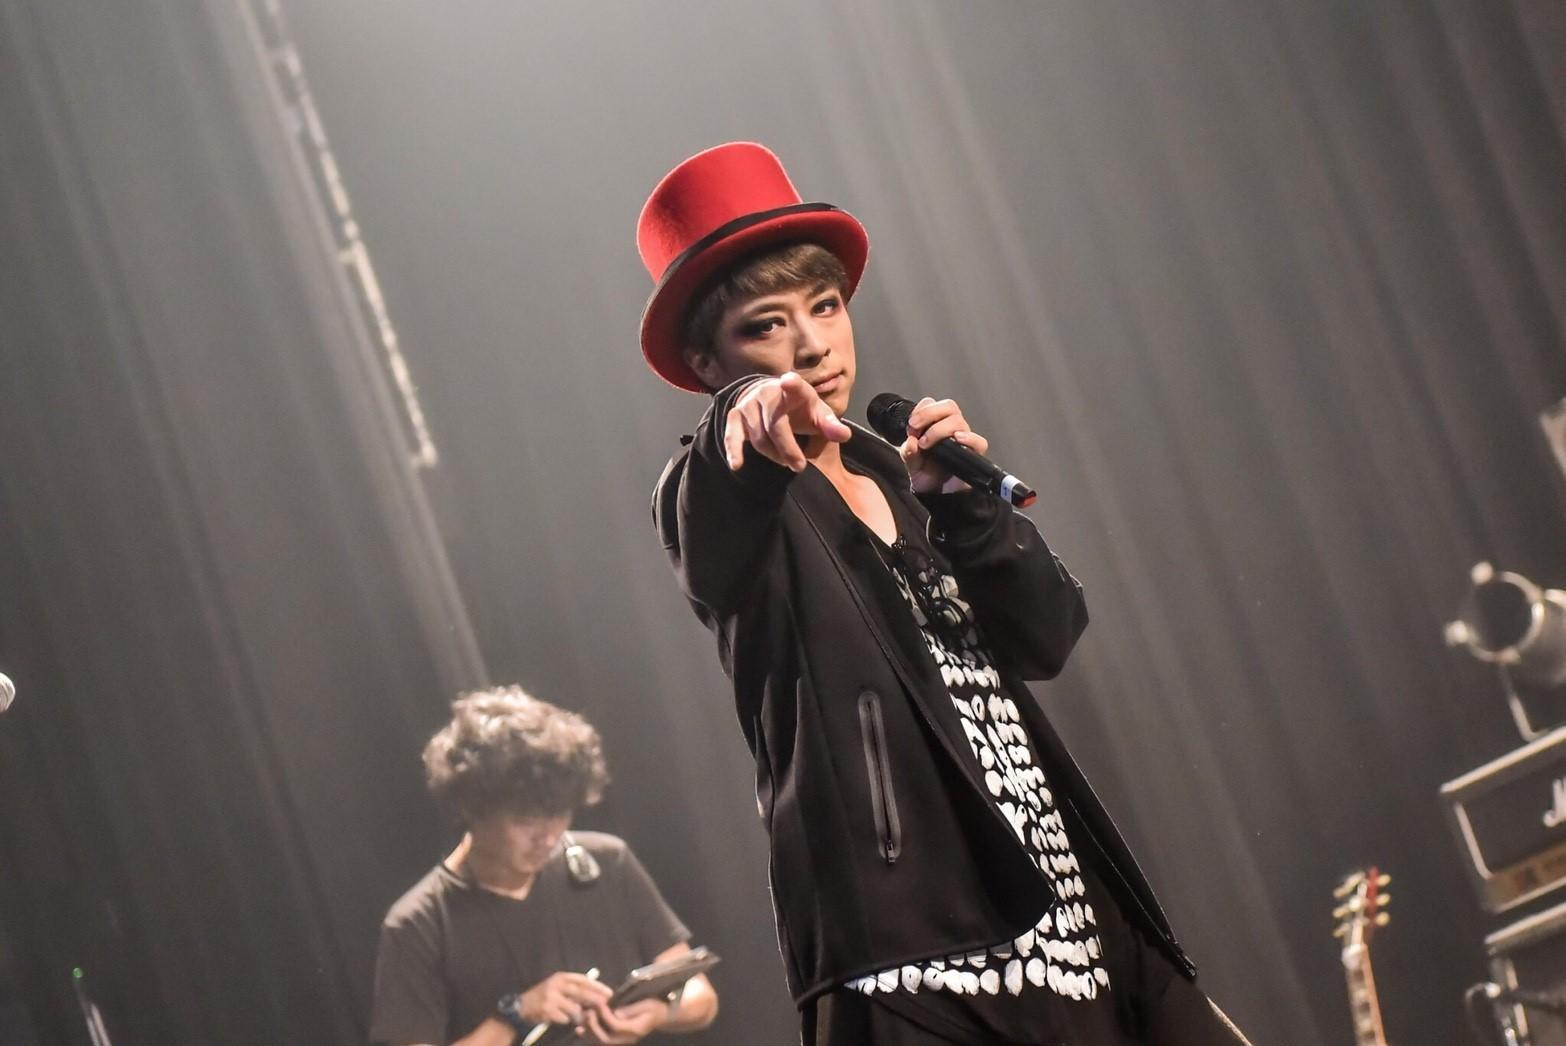 http://news.yoshimoto.co.jp/20180928204040-d3785be9bc6be34a439eb588f4413d1b91c16383.jpg